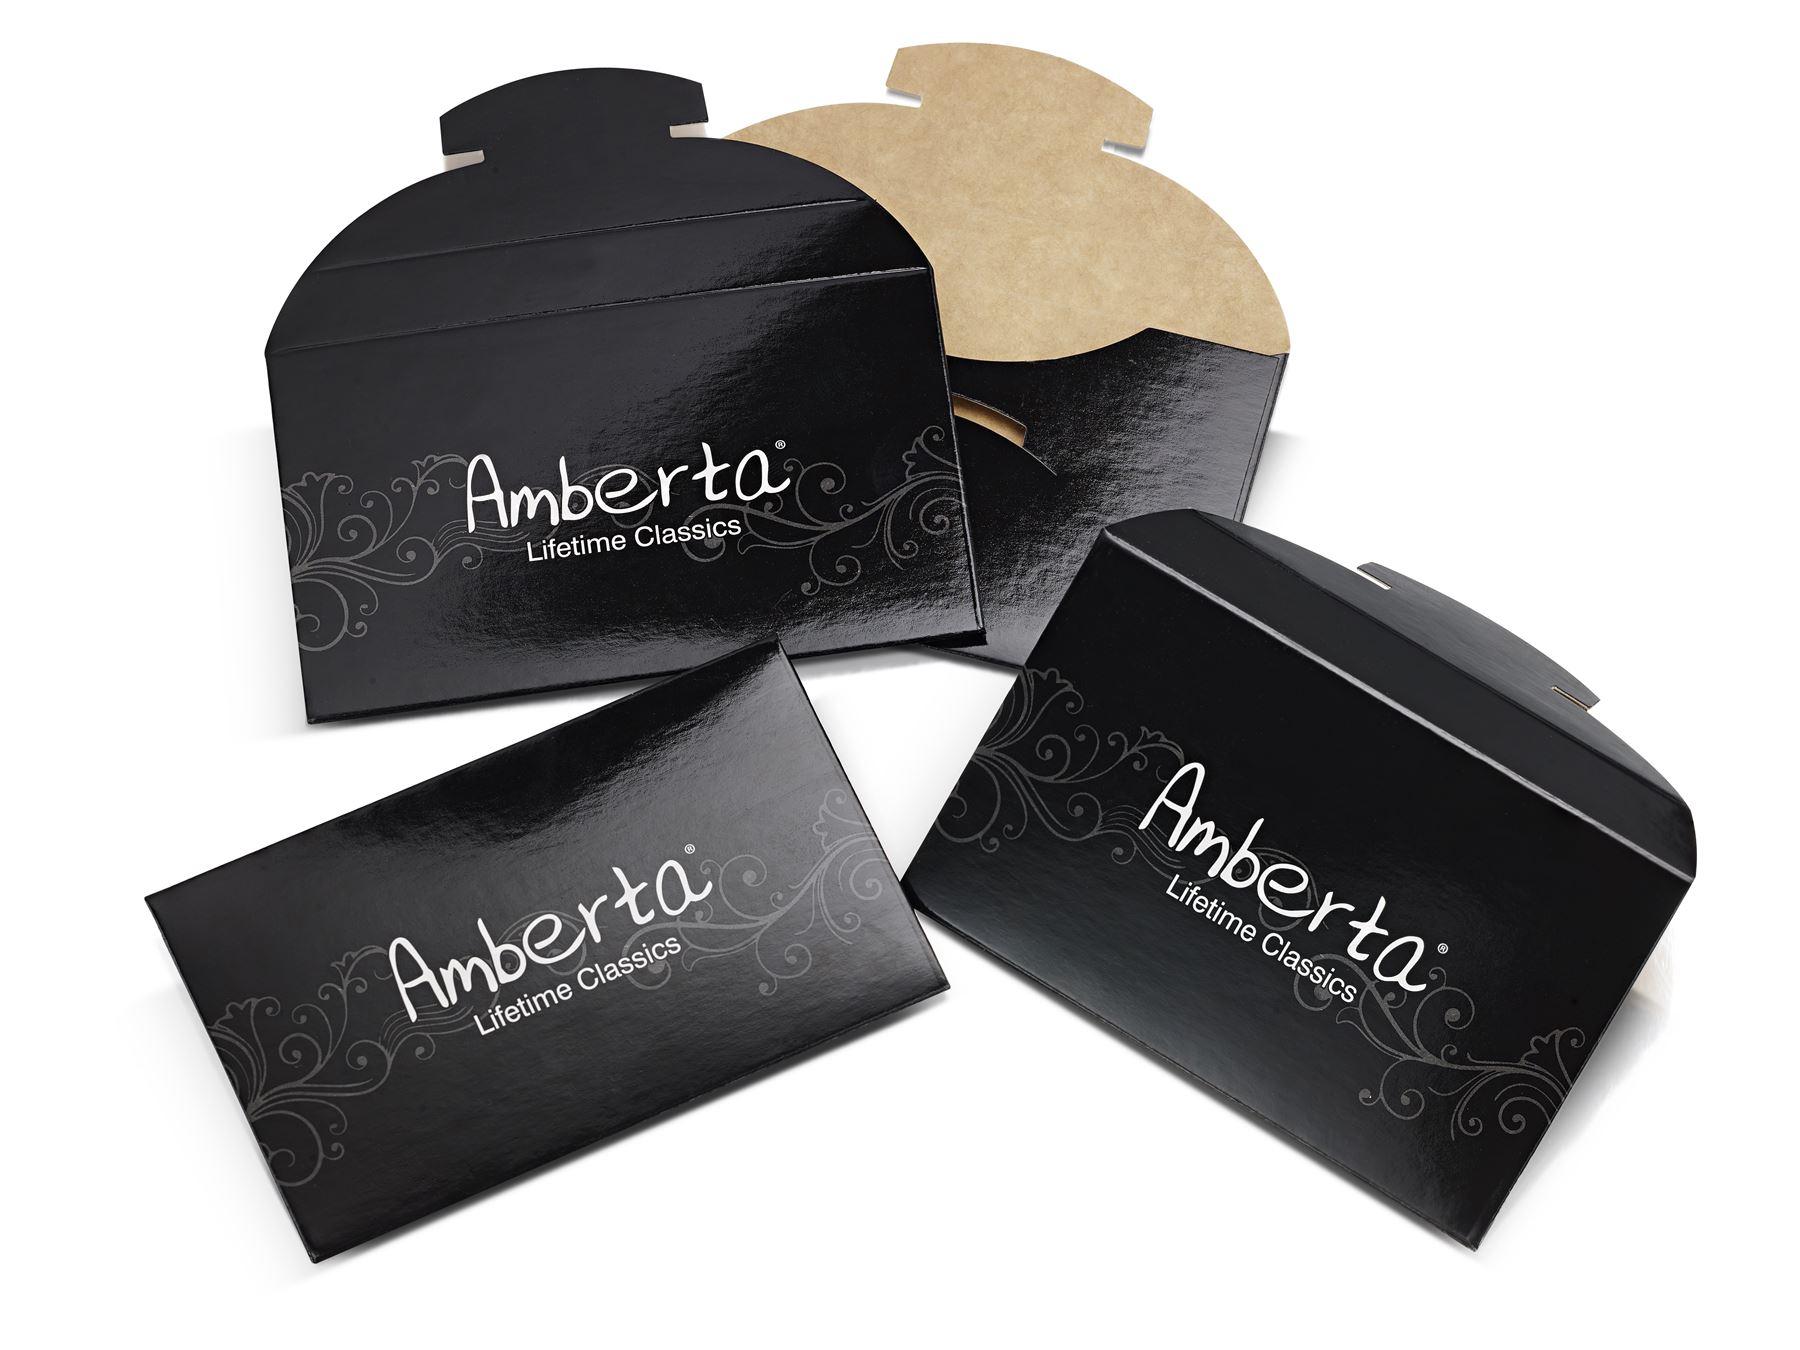 Amberta-Jewelry-925-Sterling-Silver-Adjustable-Bracelet-Italian-Bangle-for-Women miniature 58